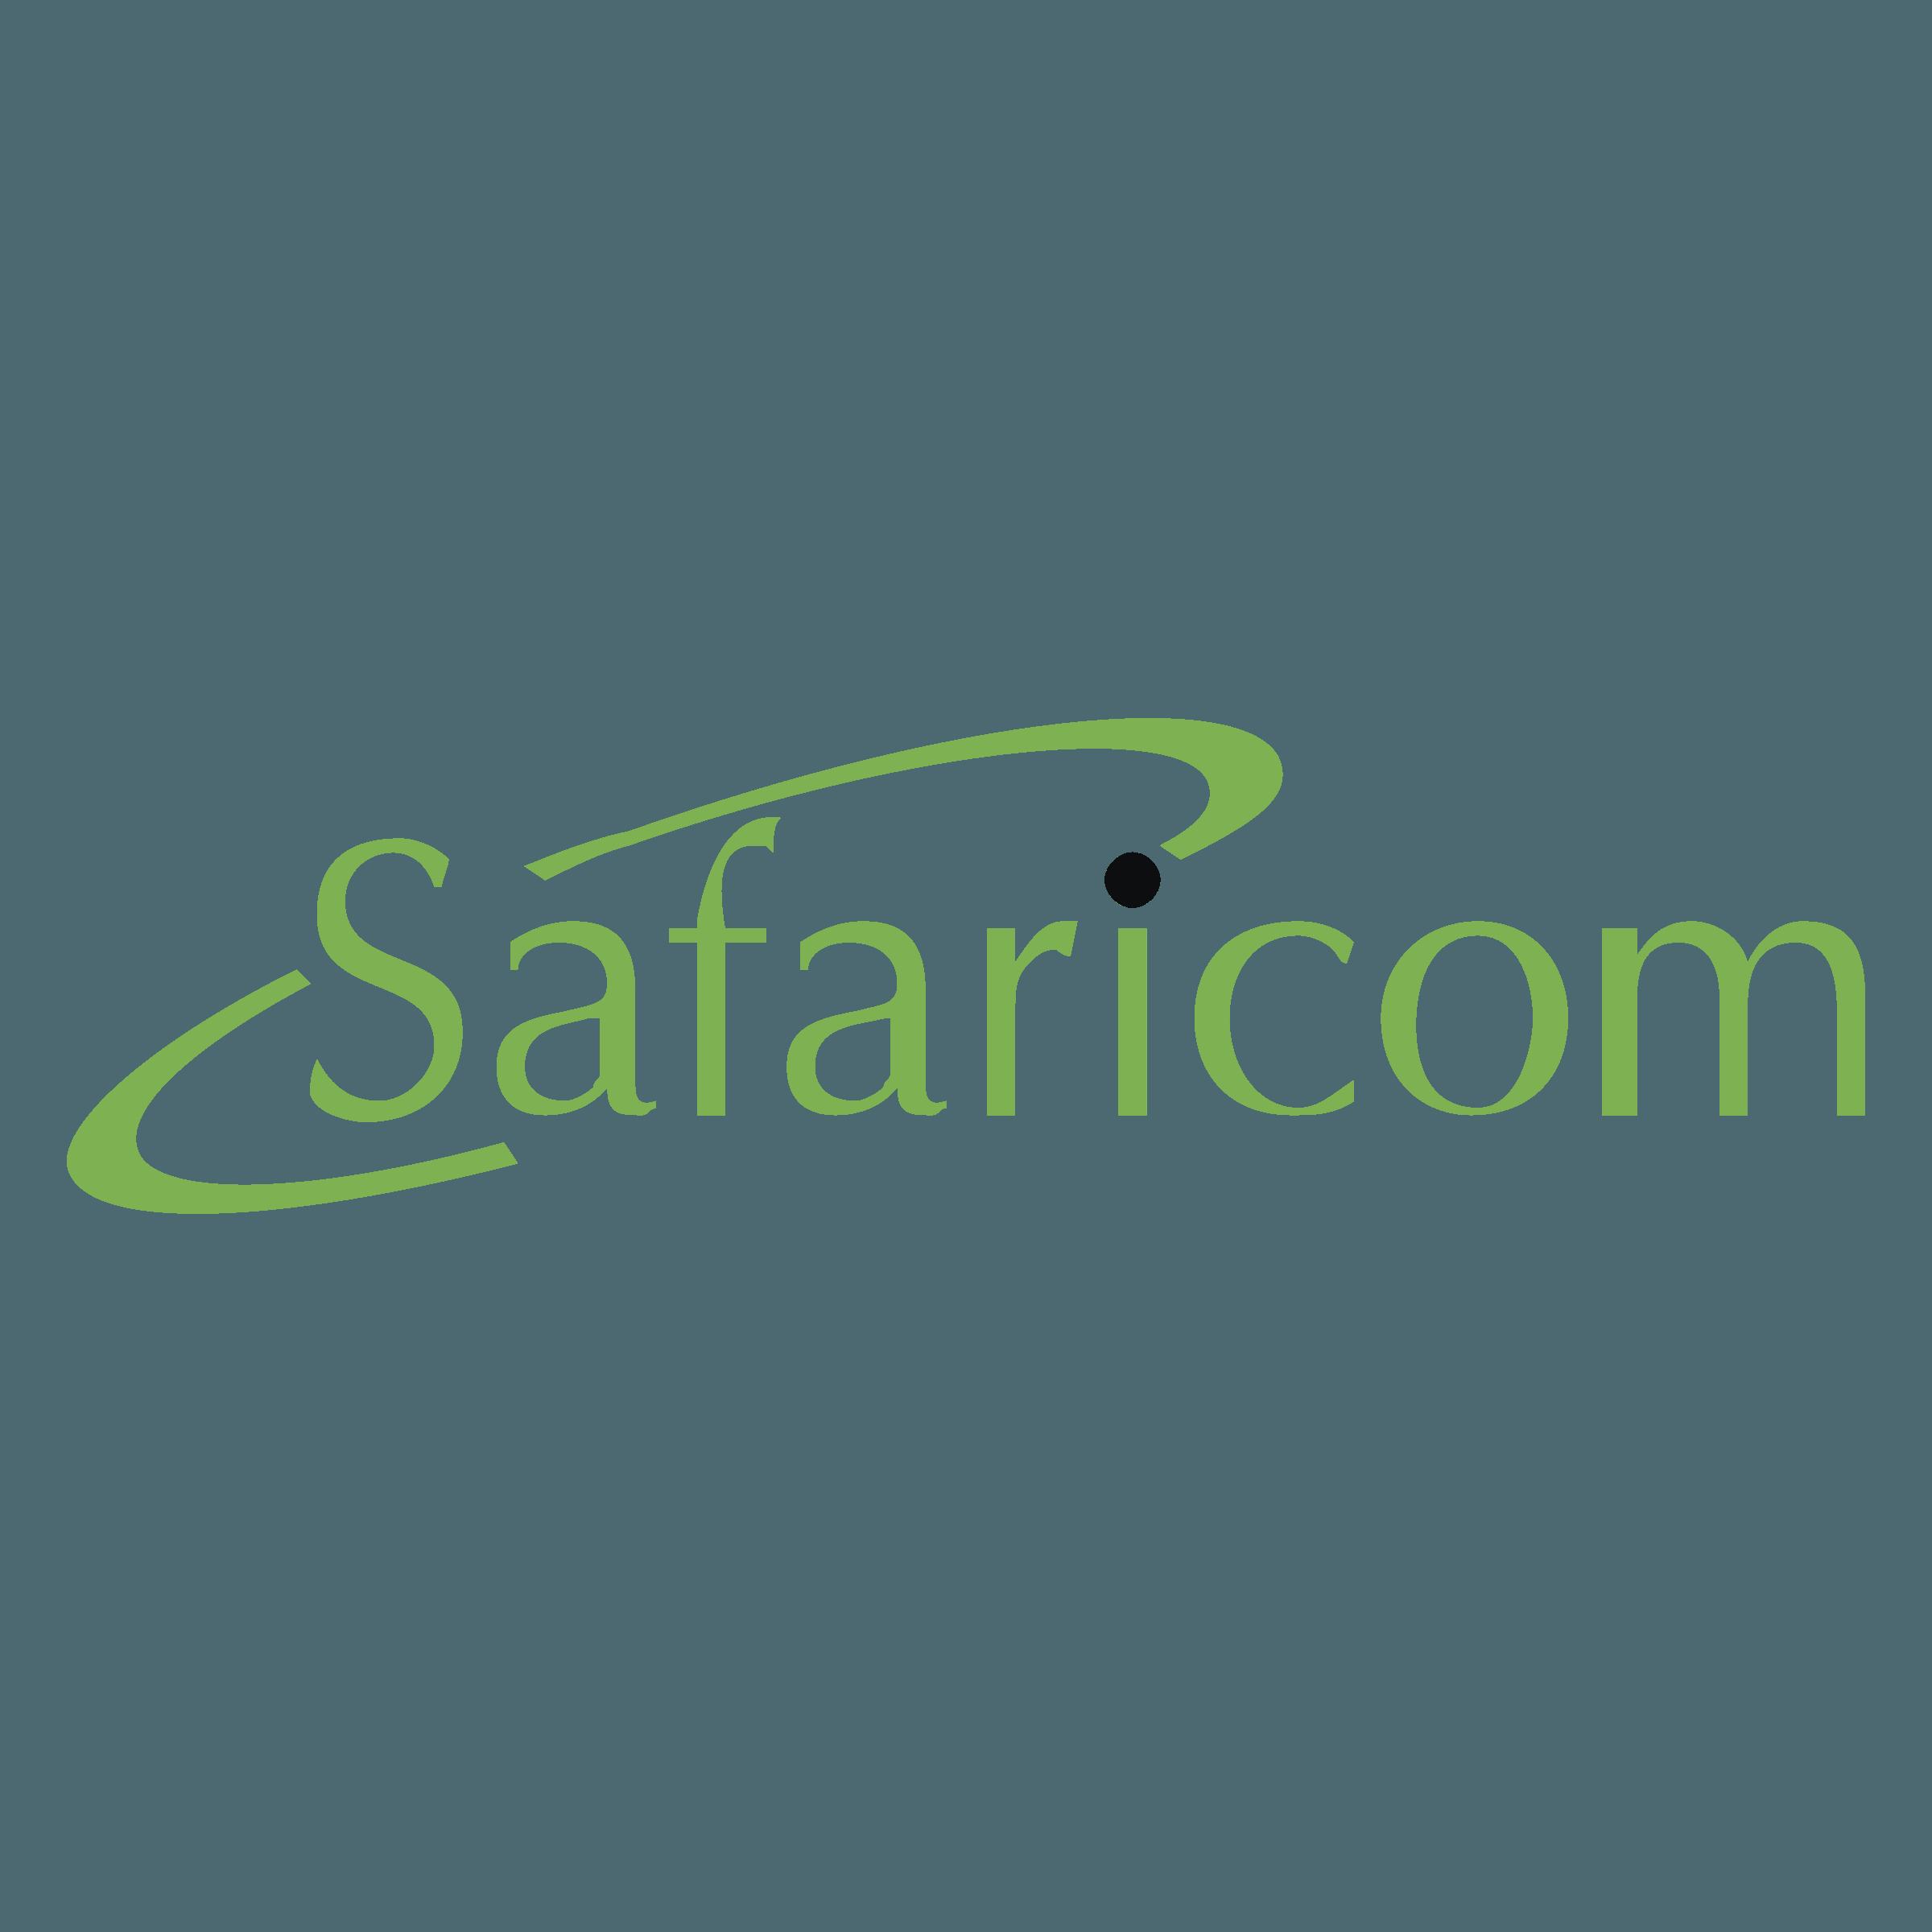 Safaricom Logo.